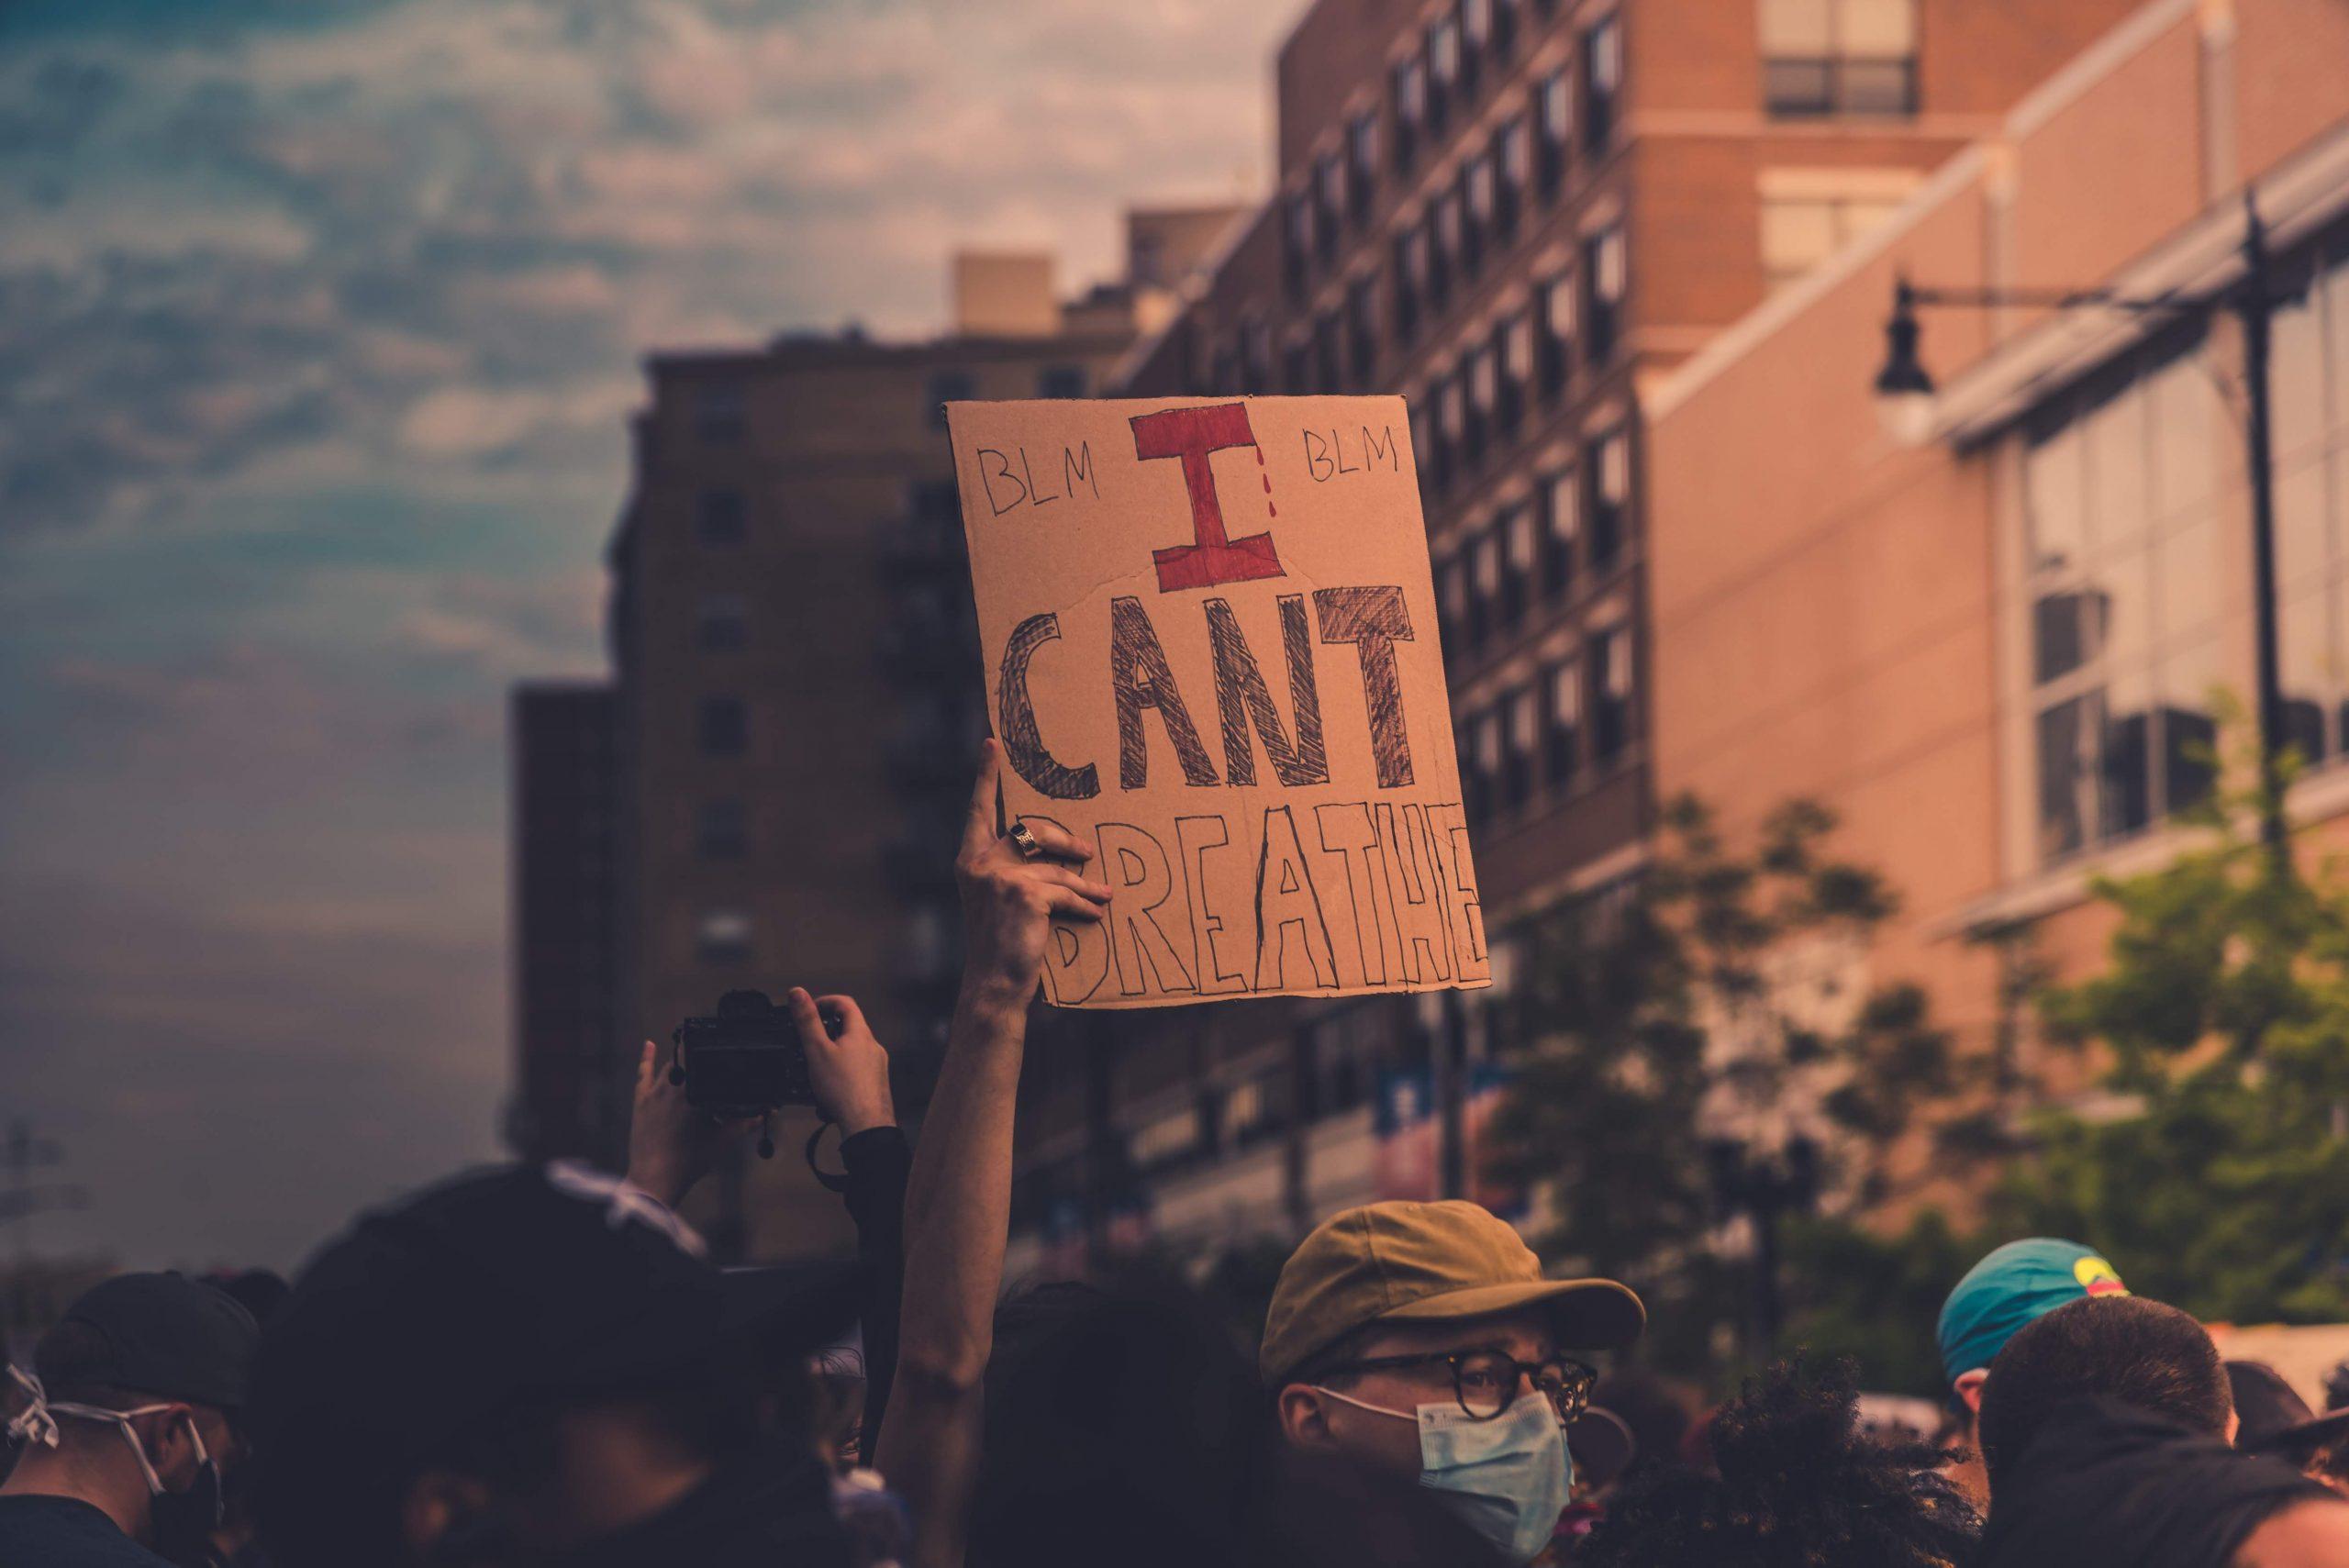 I can't breathe minnepolis protest